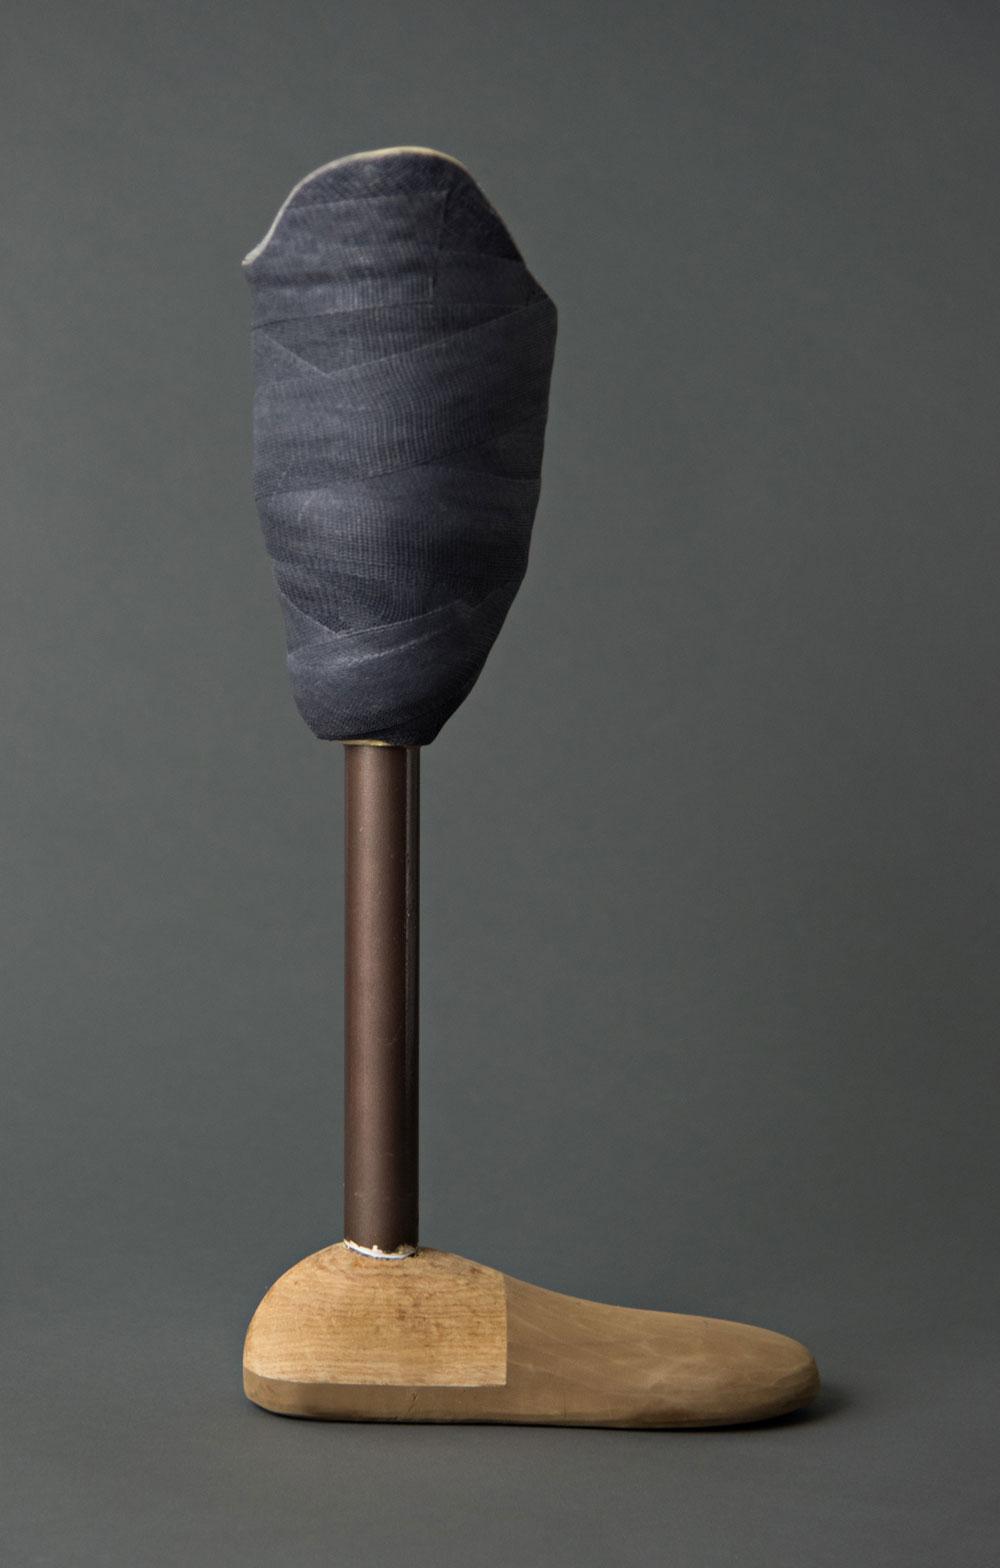 image of an prosthetic leg